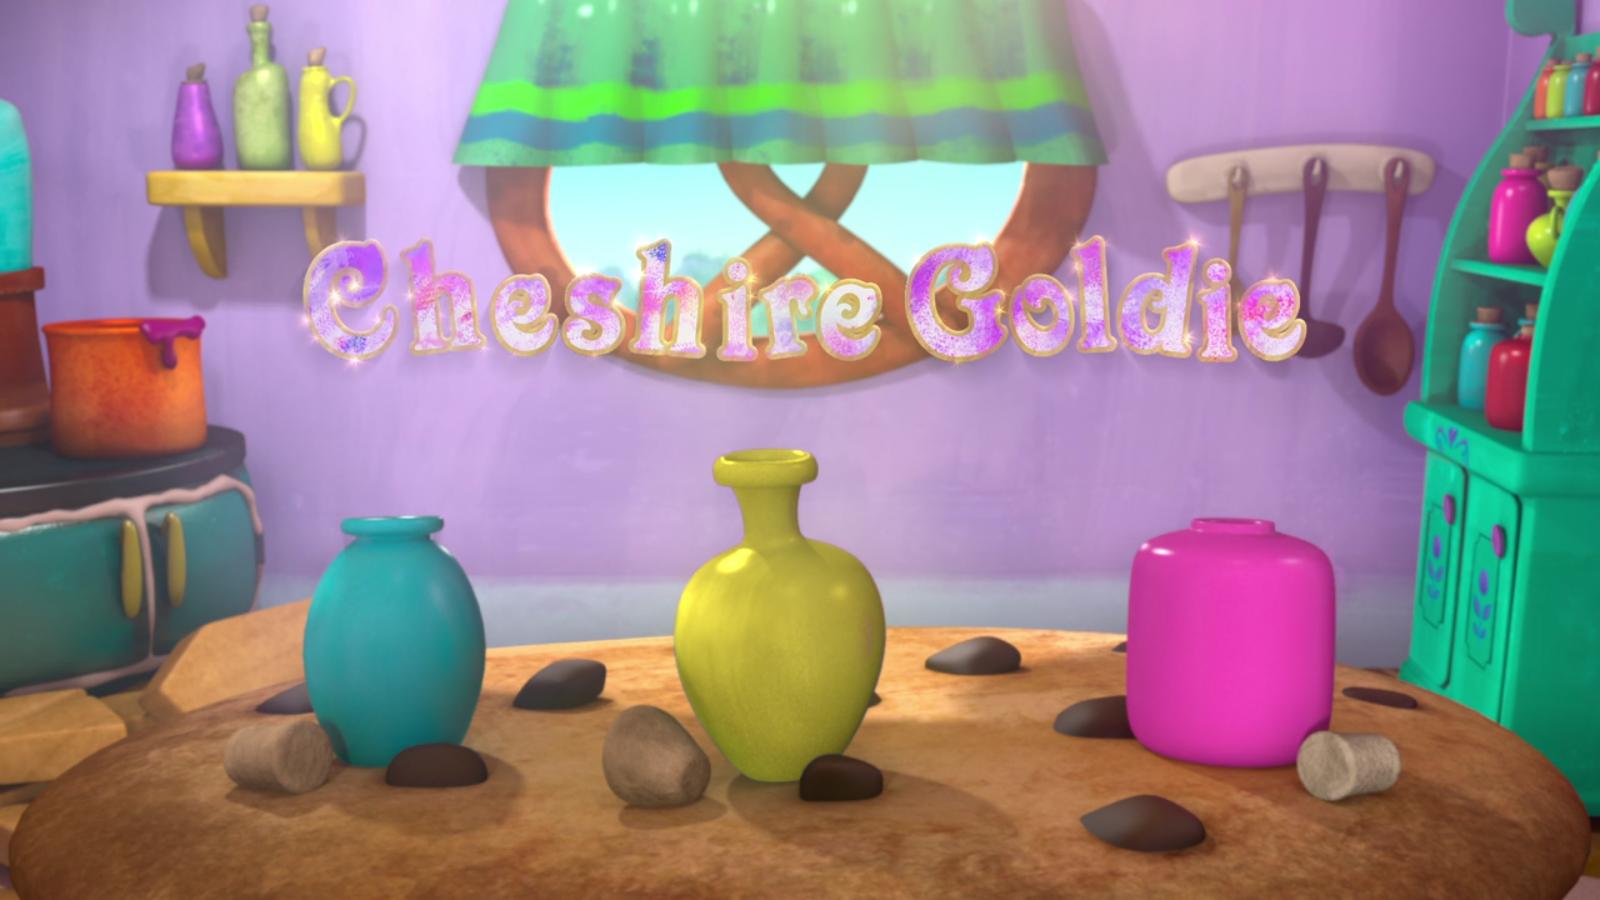 Cheshire Goldie